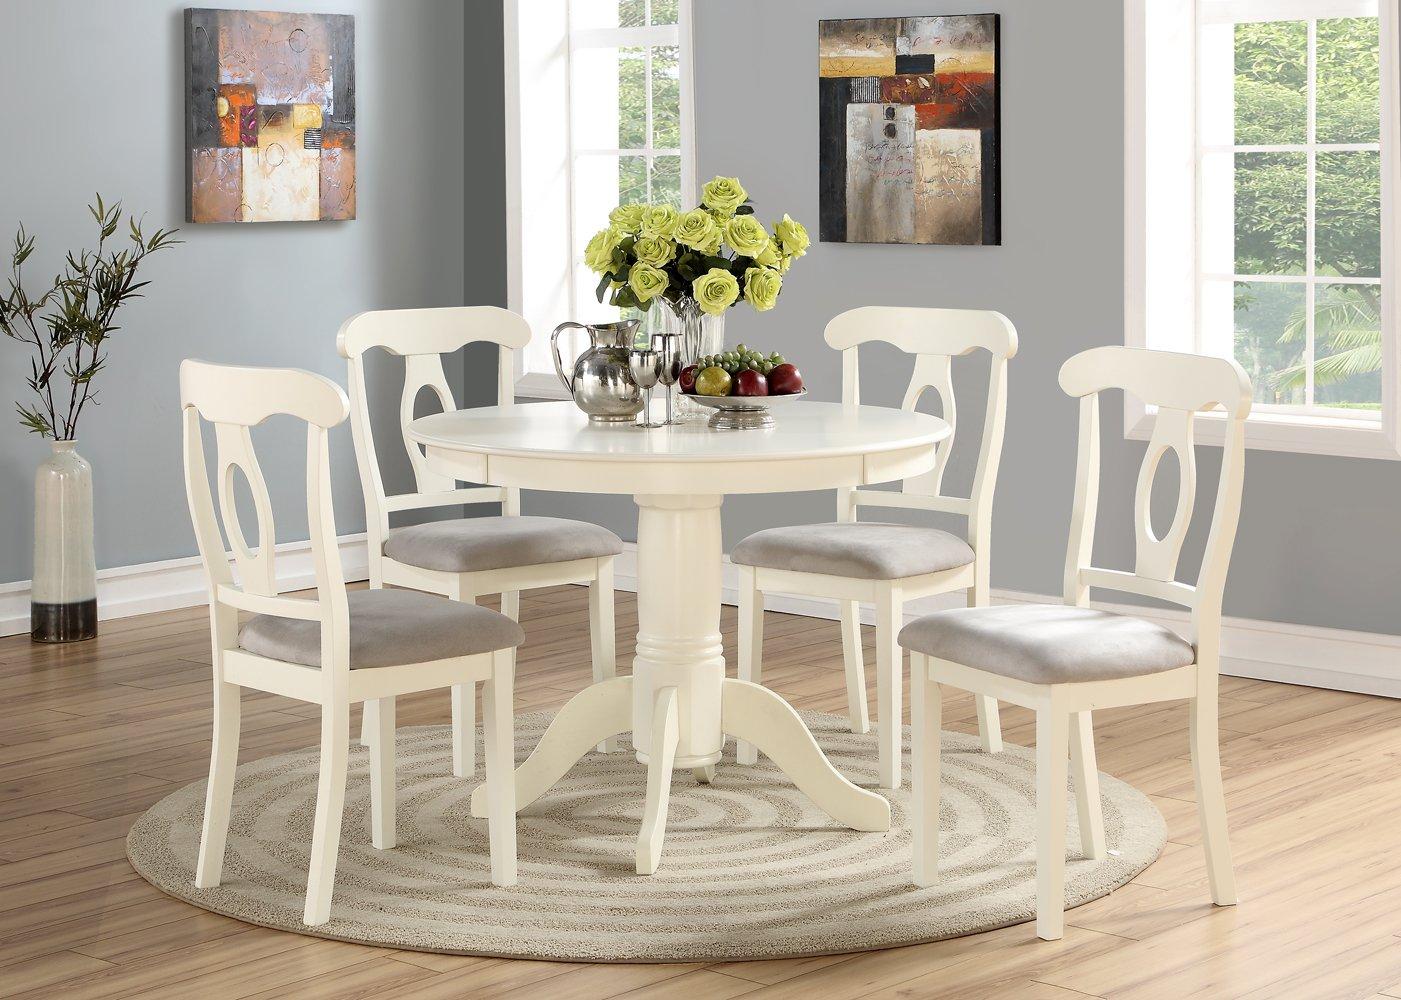 Angel Line 23511-21 5 Piece Lindsey Dining Set, White/Gray